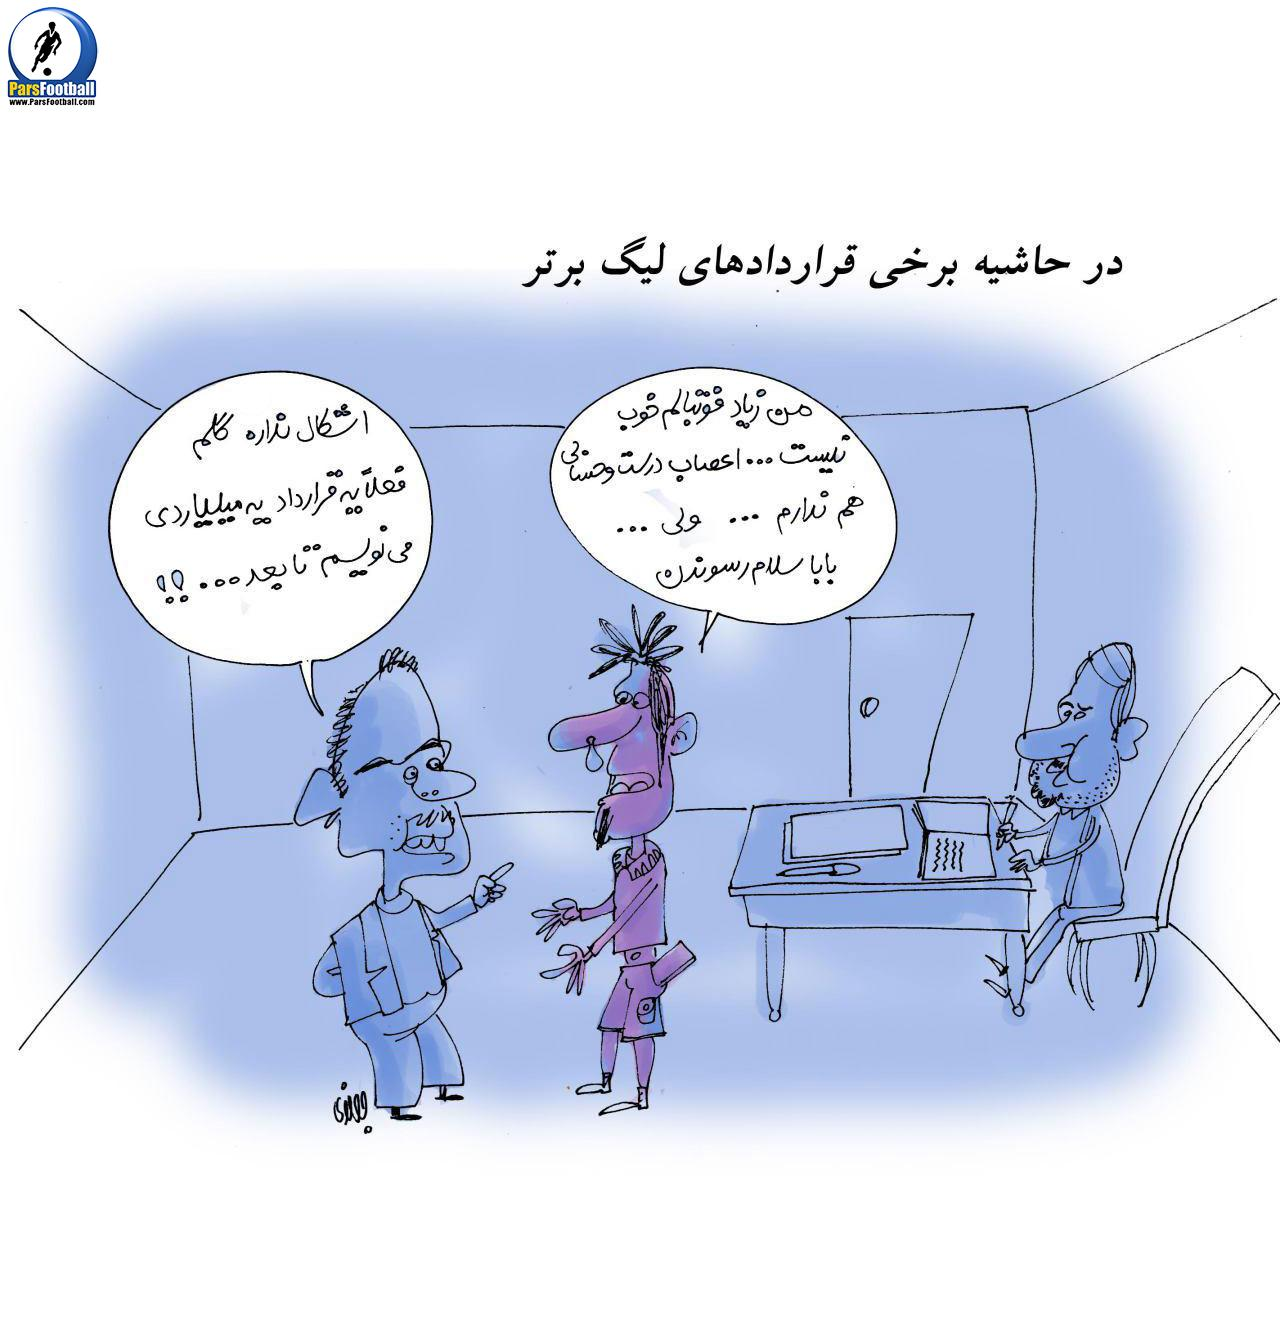 karikator_gharardad